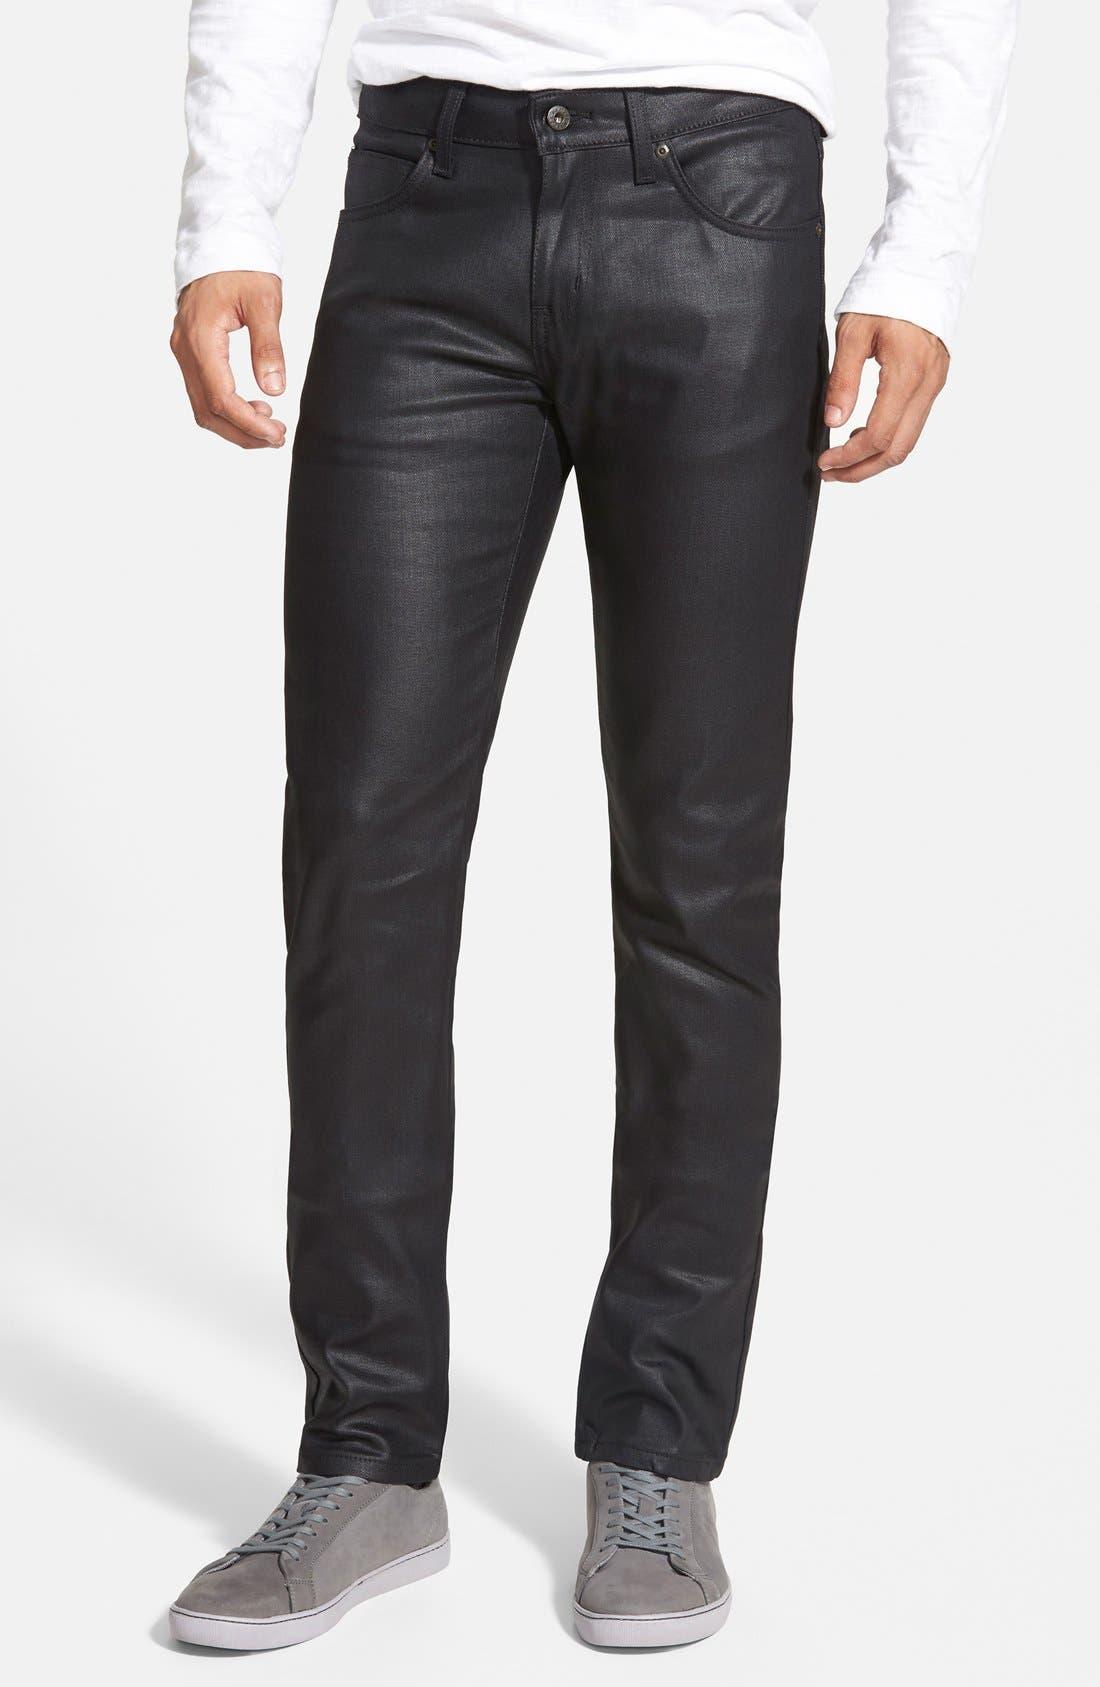 Super Skinny Guy Skinny Stretch Jeans,                         Main,                         color, 001